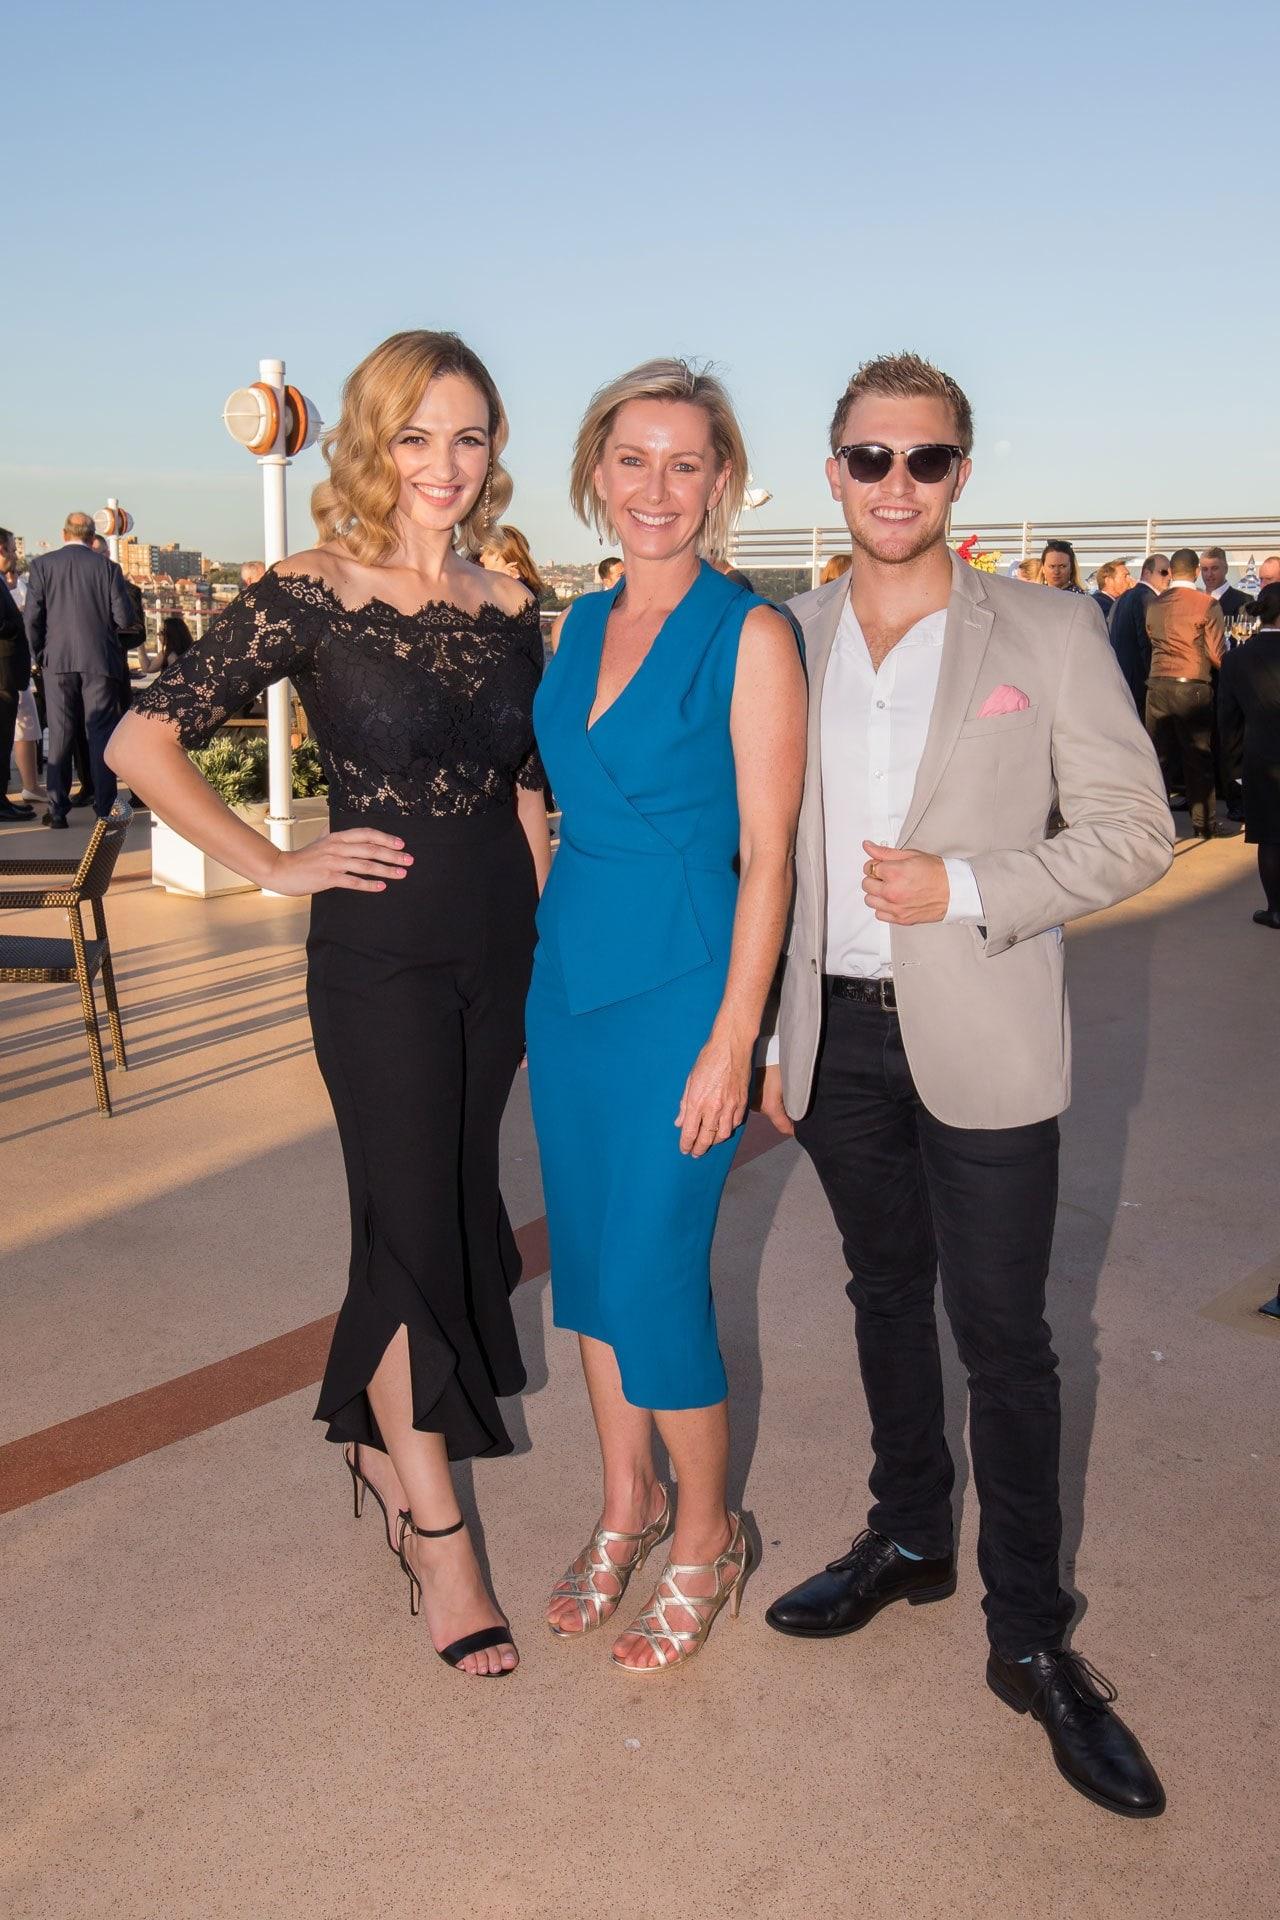 Daniella Boutros, Deborah Knight and Josh Del Pozo on-board the Queen Elizabeth